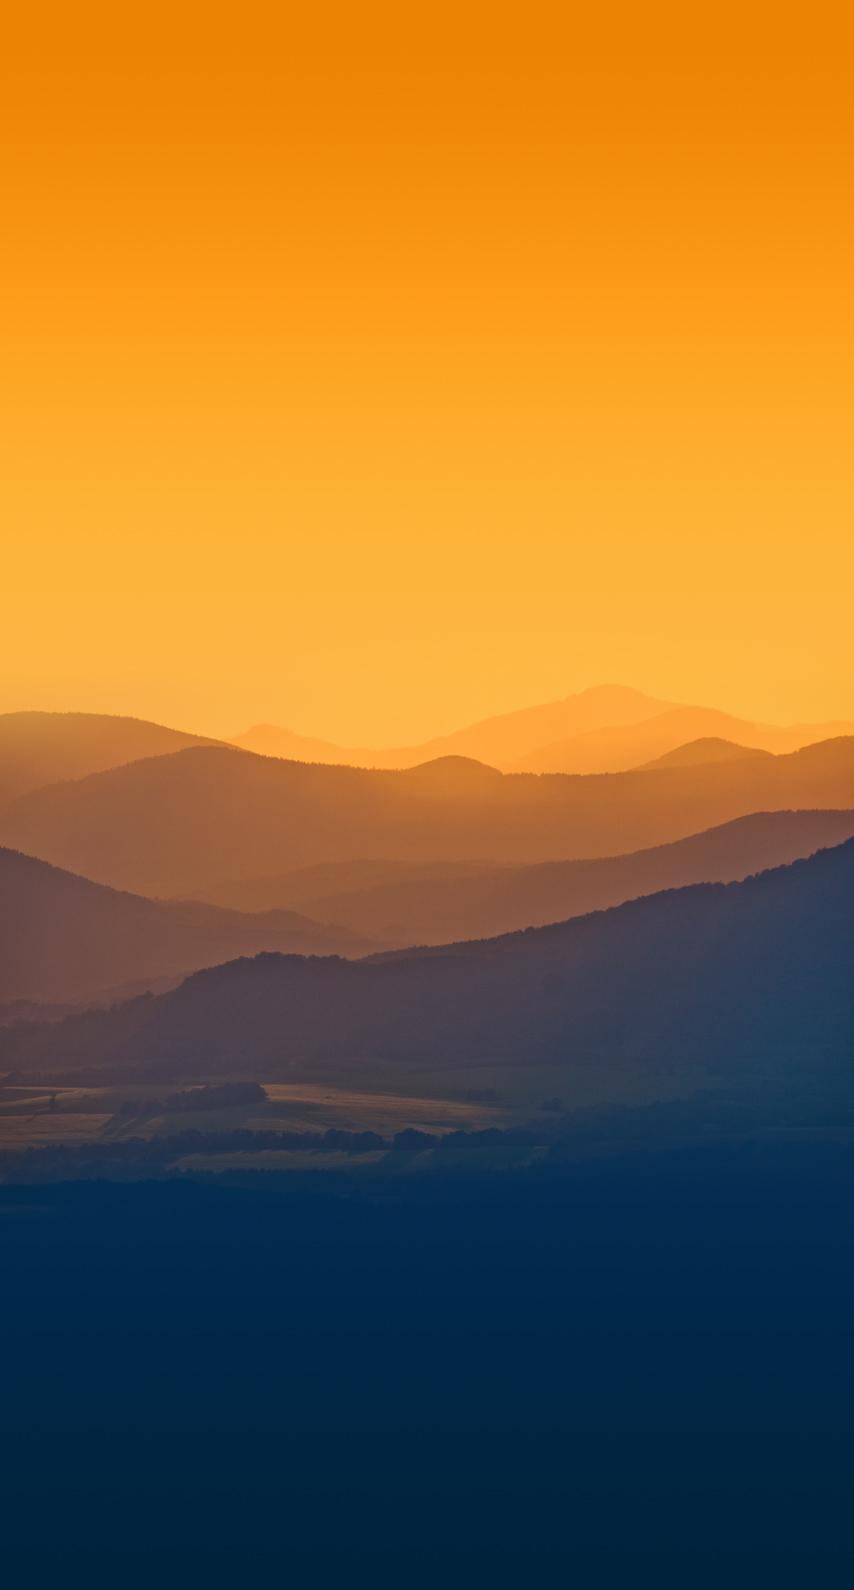 sunset, light, galaxy, bright, fantasy, hills, art, mountain, fog, evening, sun, no person, dawn, dusk